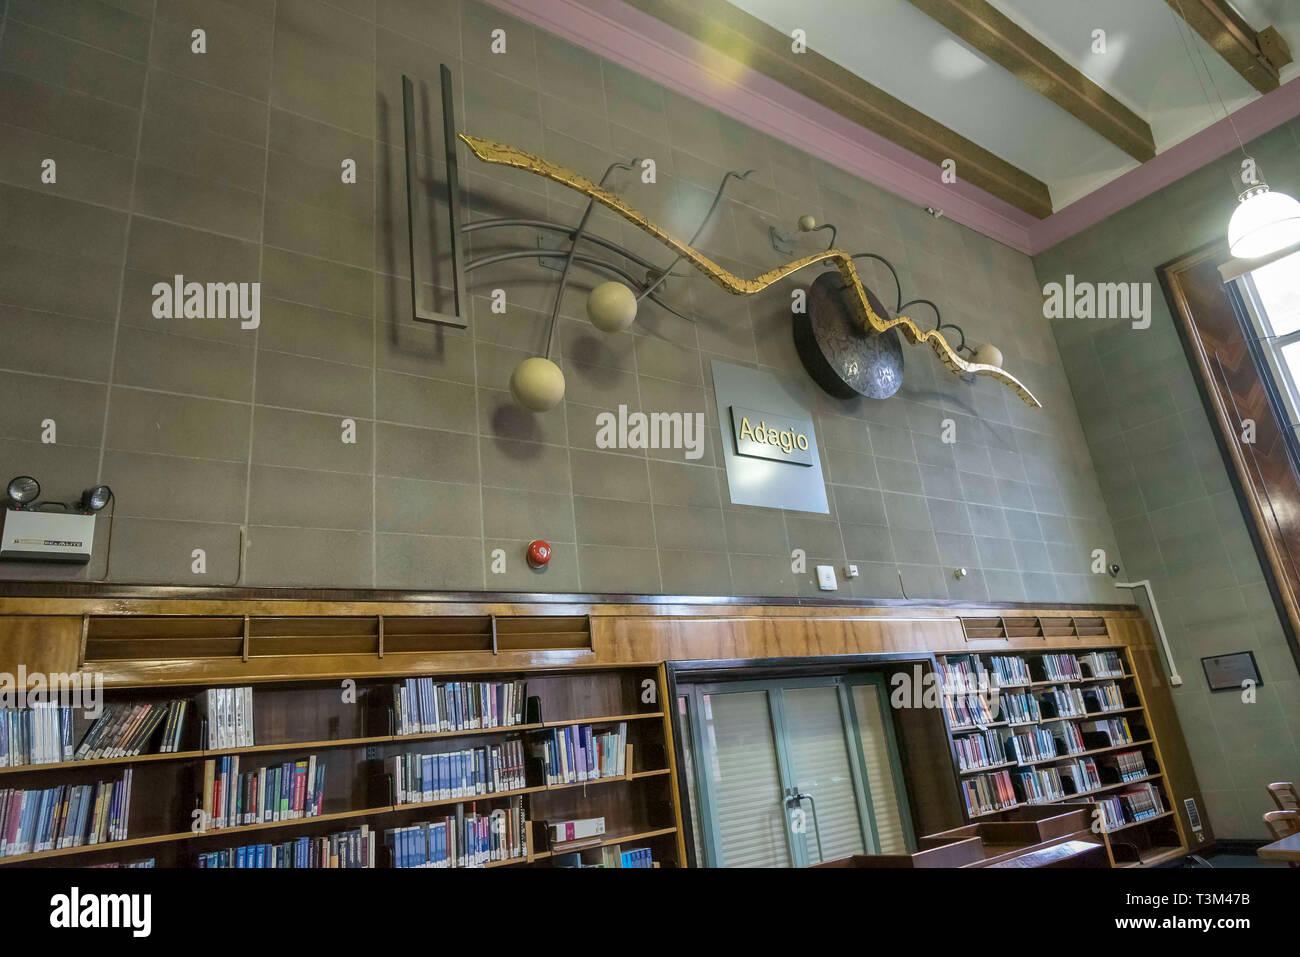 Artwork Adagio at Liverpool University Harold Cohen library - Stock Image